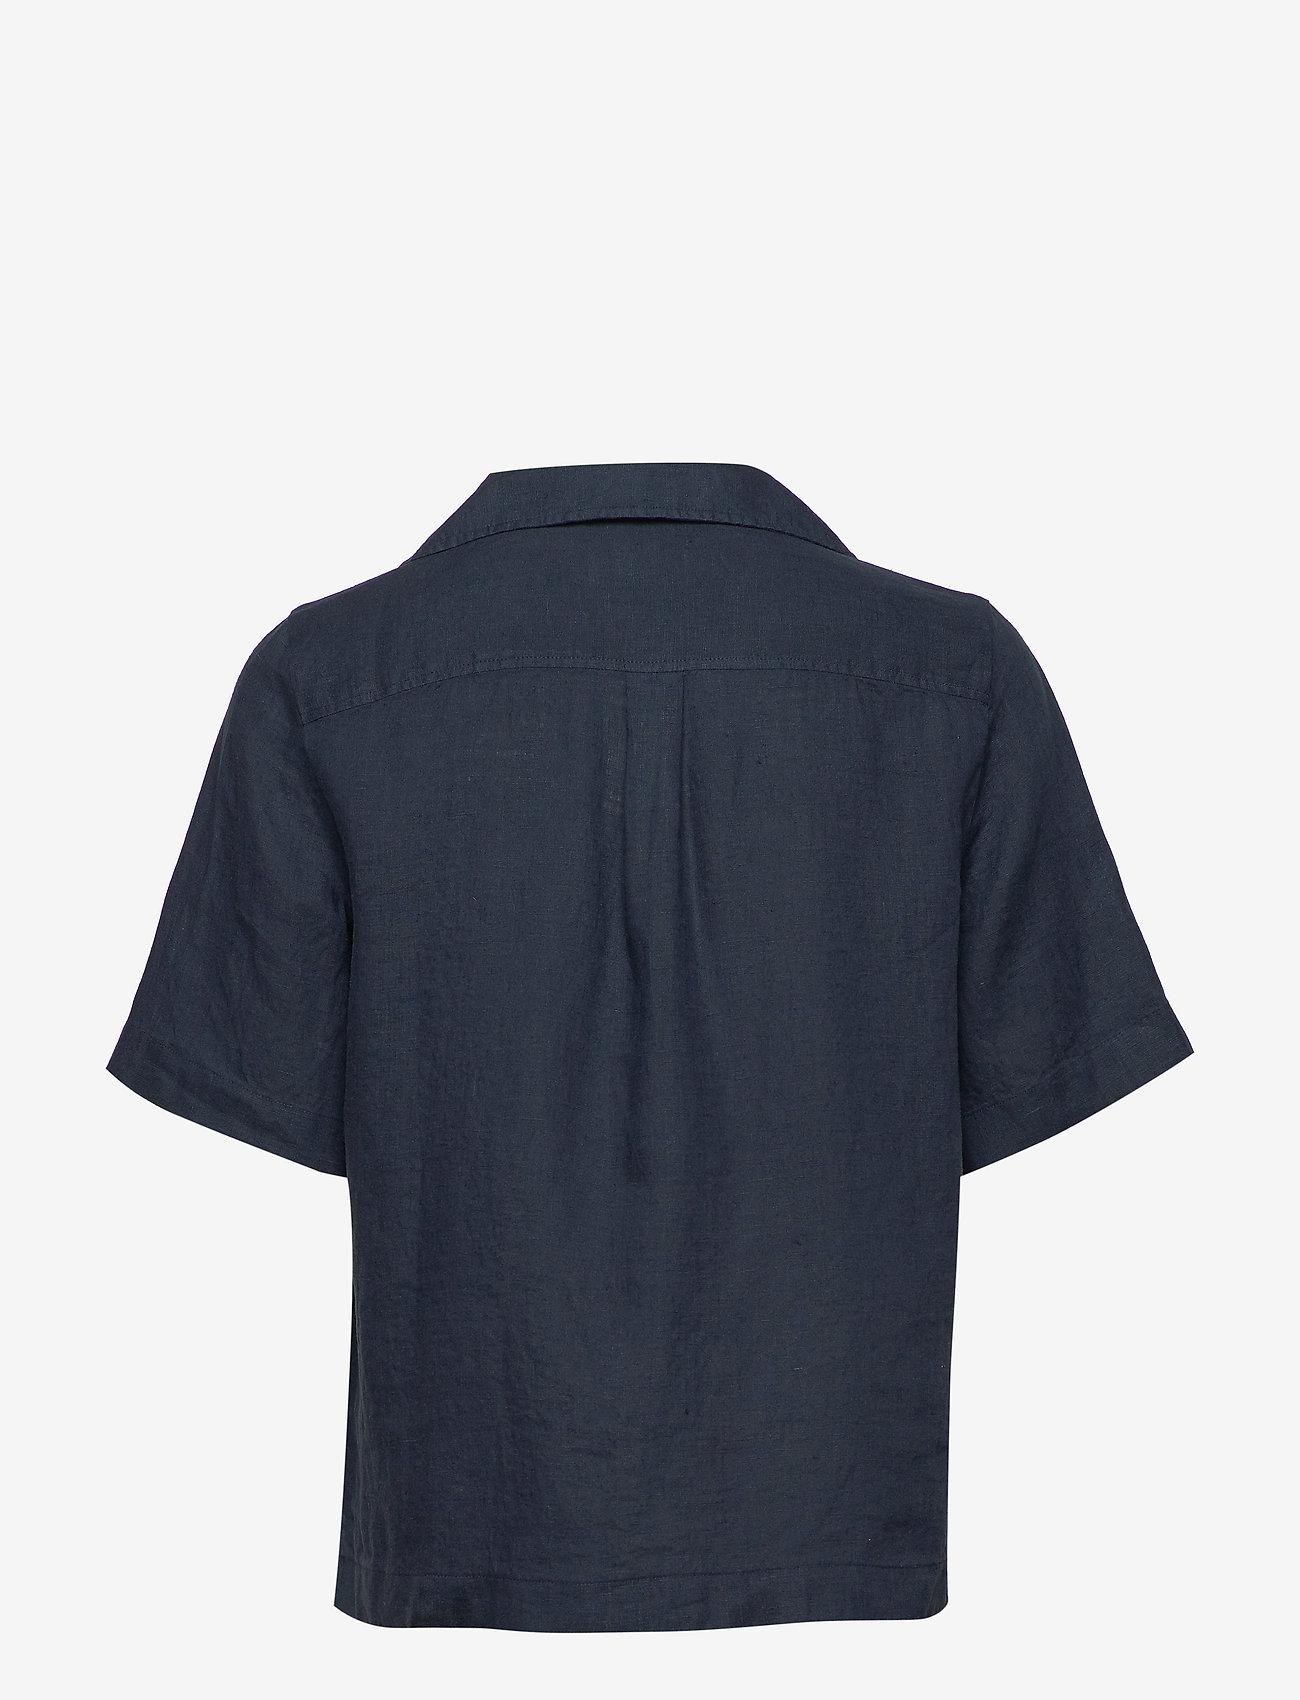 Morris Lady - Donna Linen Shirt - overhemden met korte mouwen - navy - 1